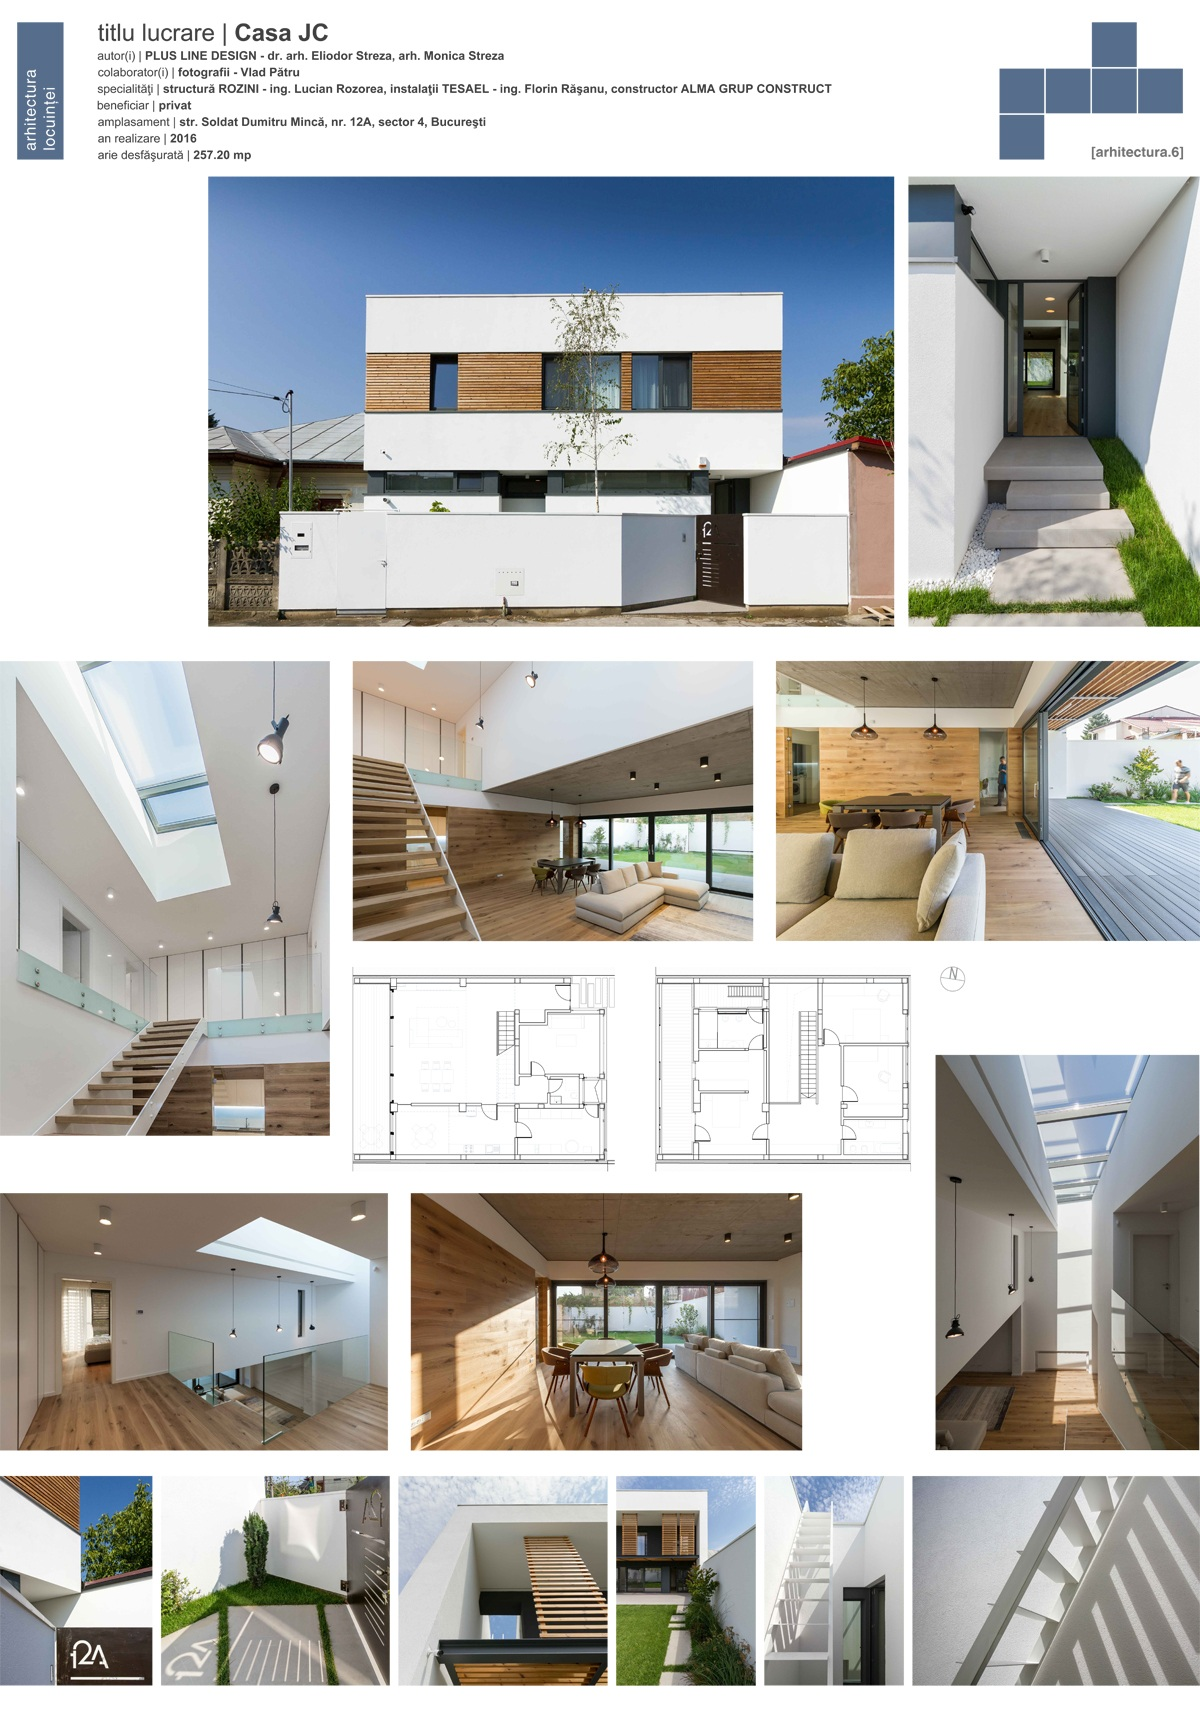 Casa JC